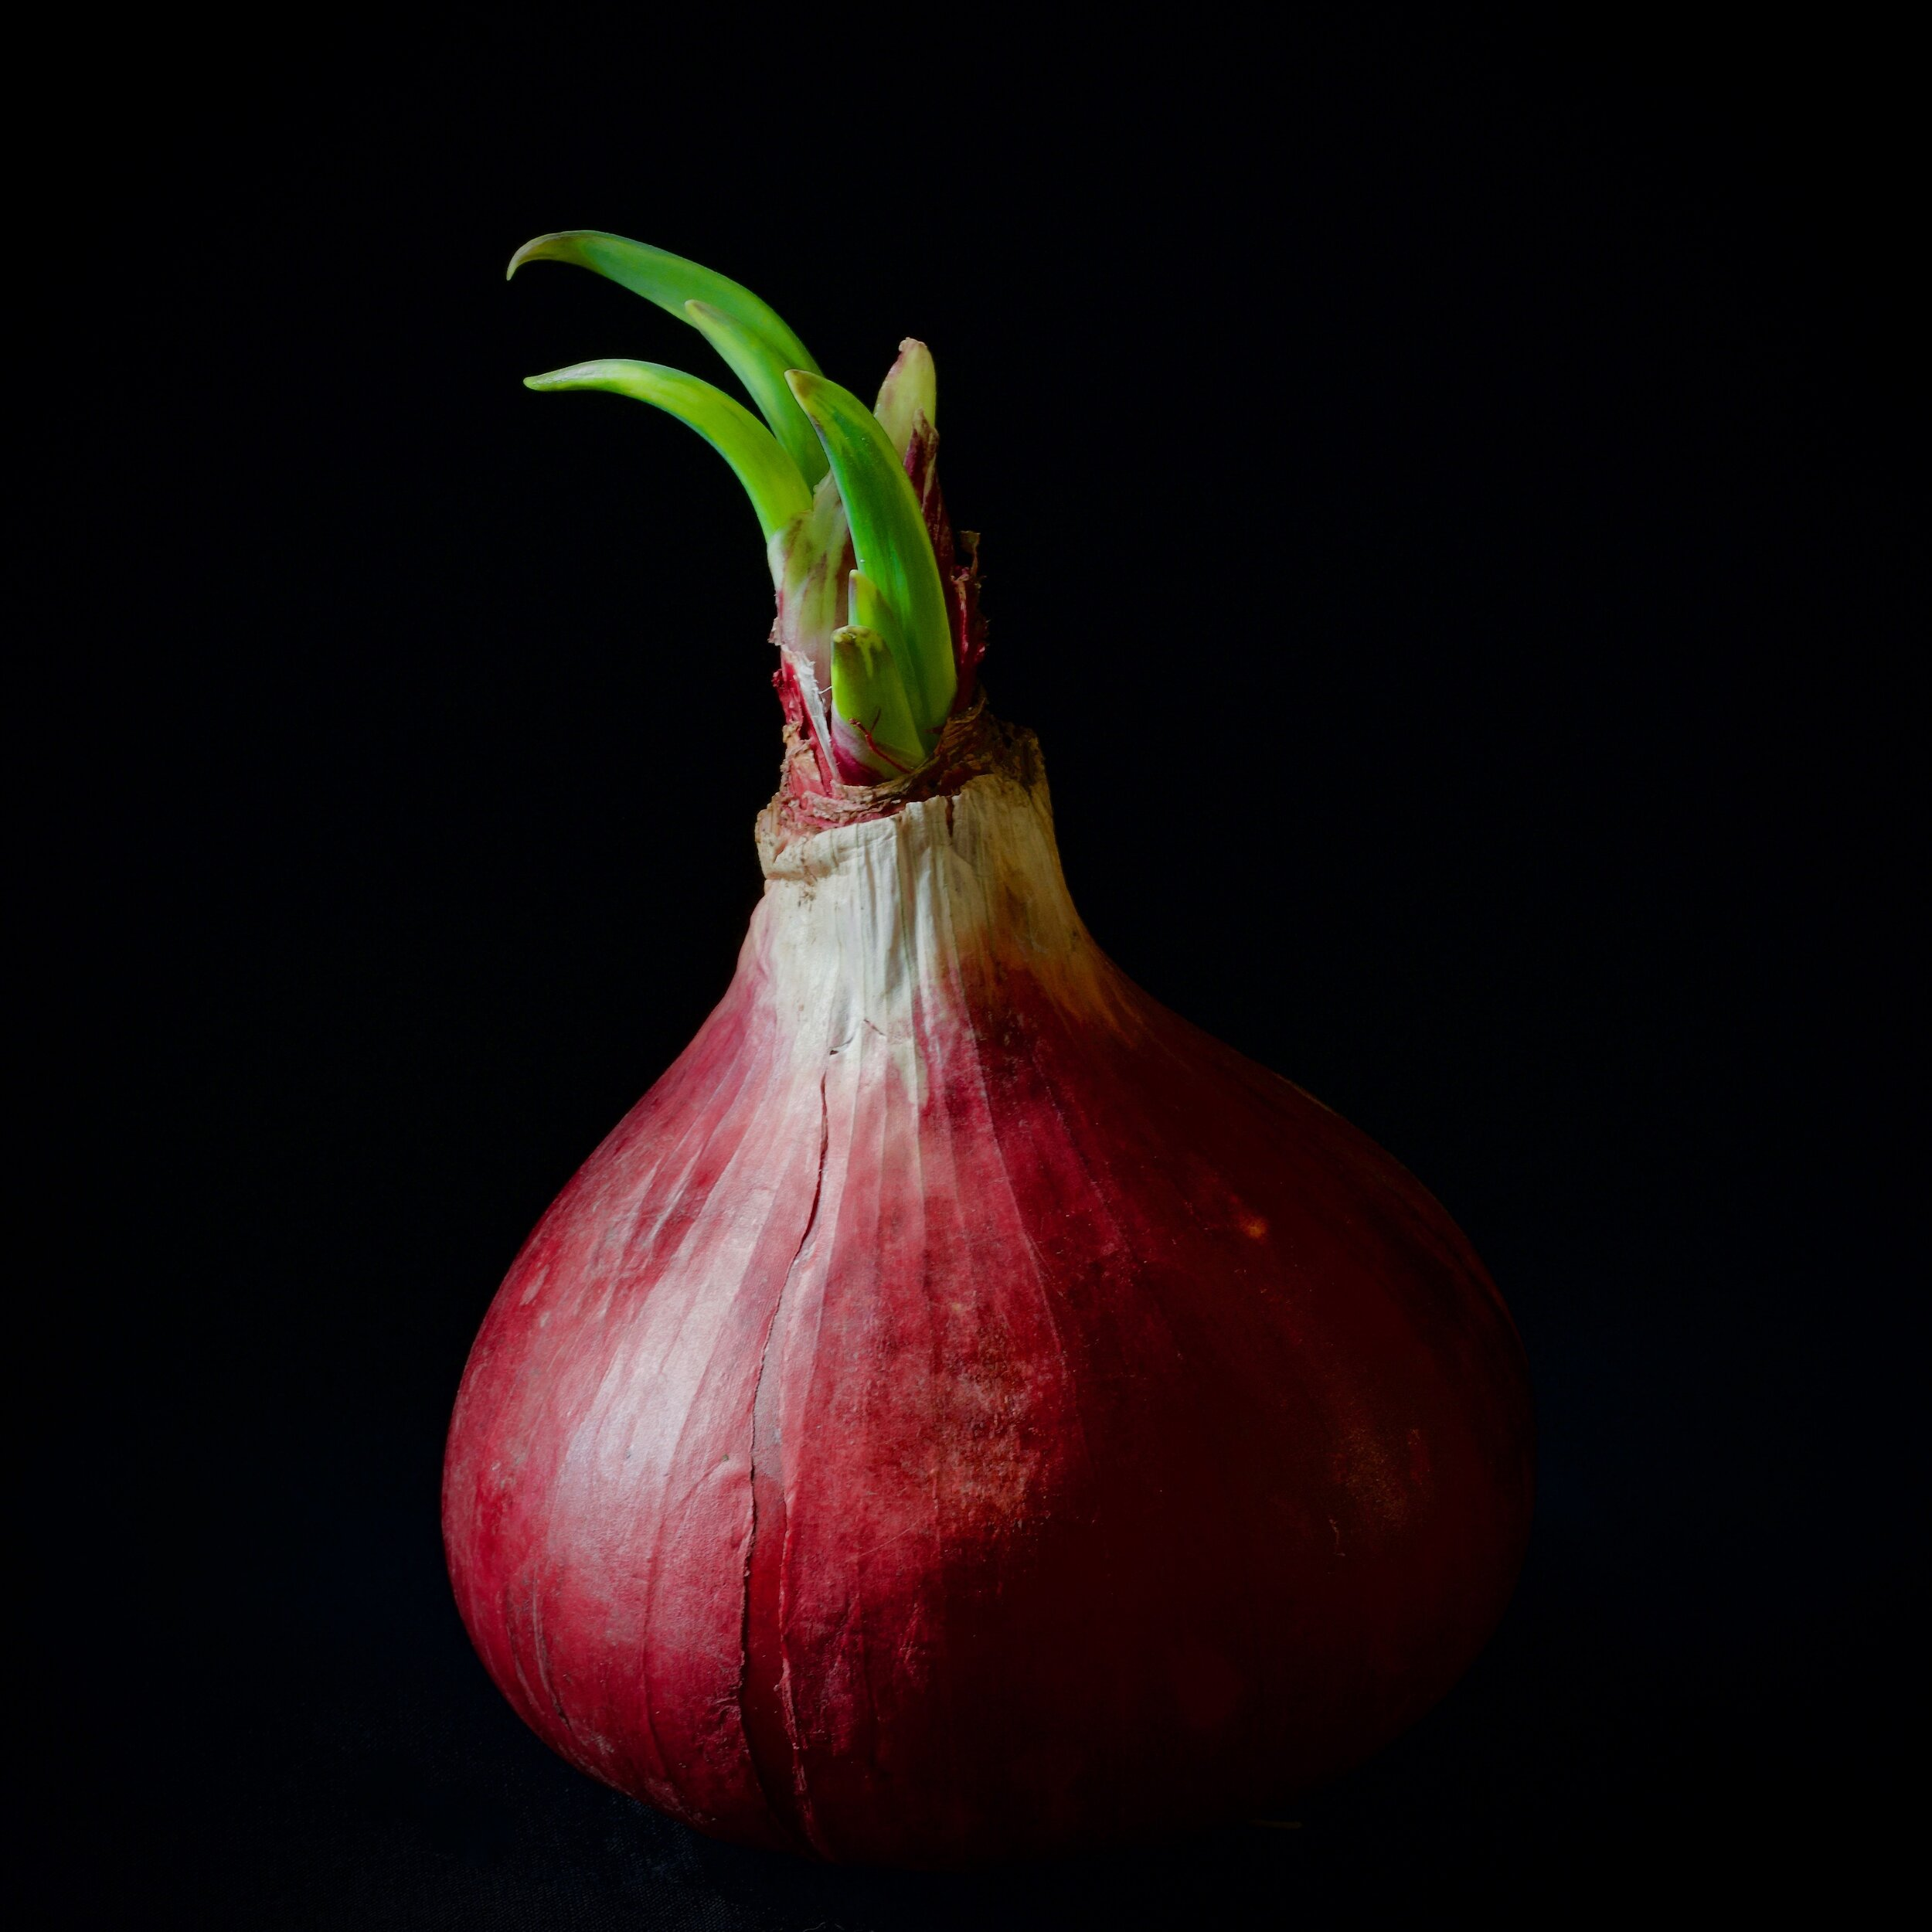 Red Onion  Camera: Fujifilm X-T3 Shutter speed: 1.6 sec Aperture: f/11 ISO: 160 Photo: Kirk McElhearn